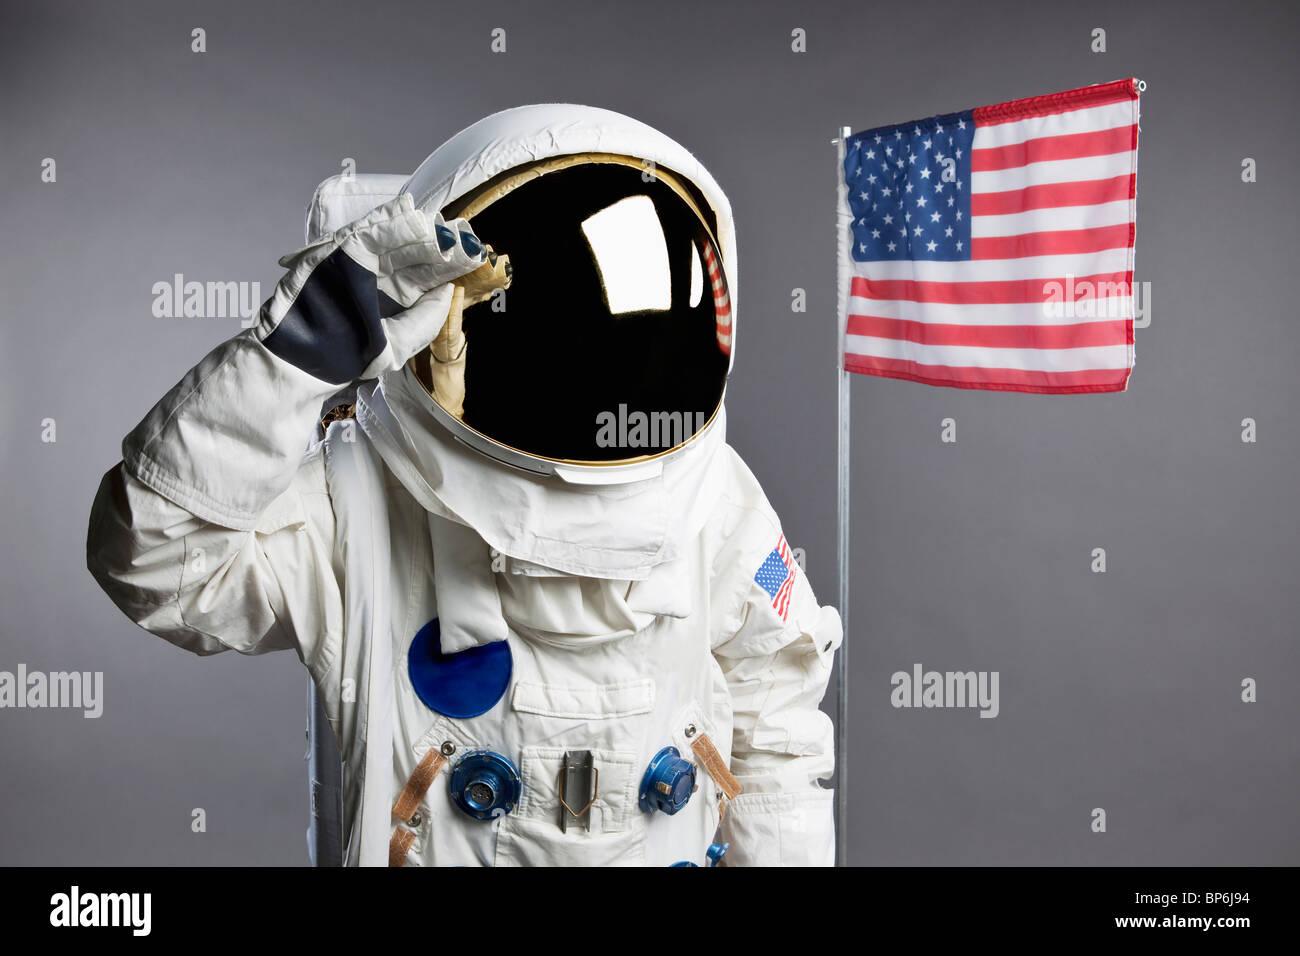 An astronaut saluting next to an American flag, studio shot - Stock Image